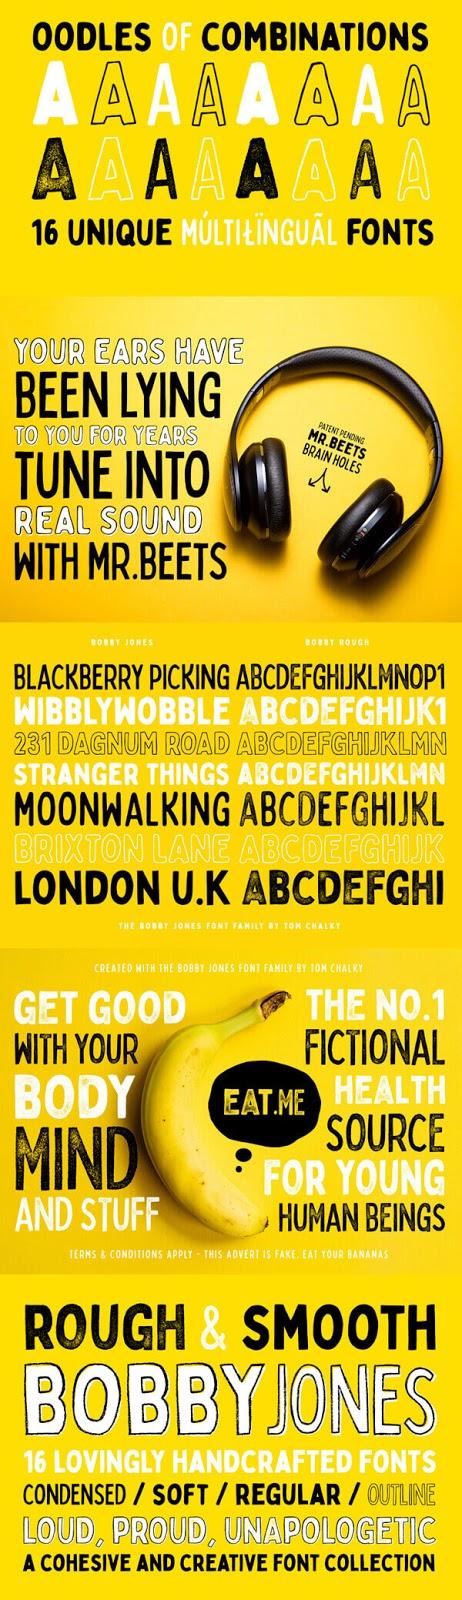 Free Font - Bobby Jones Free Font